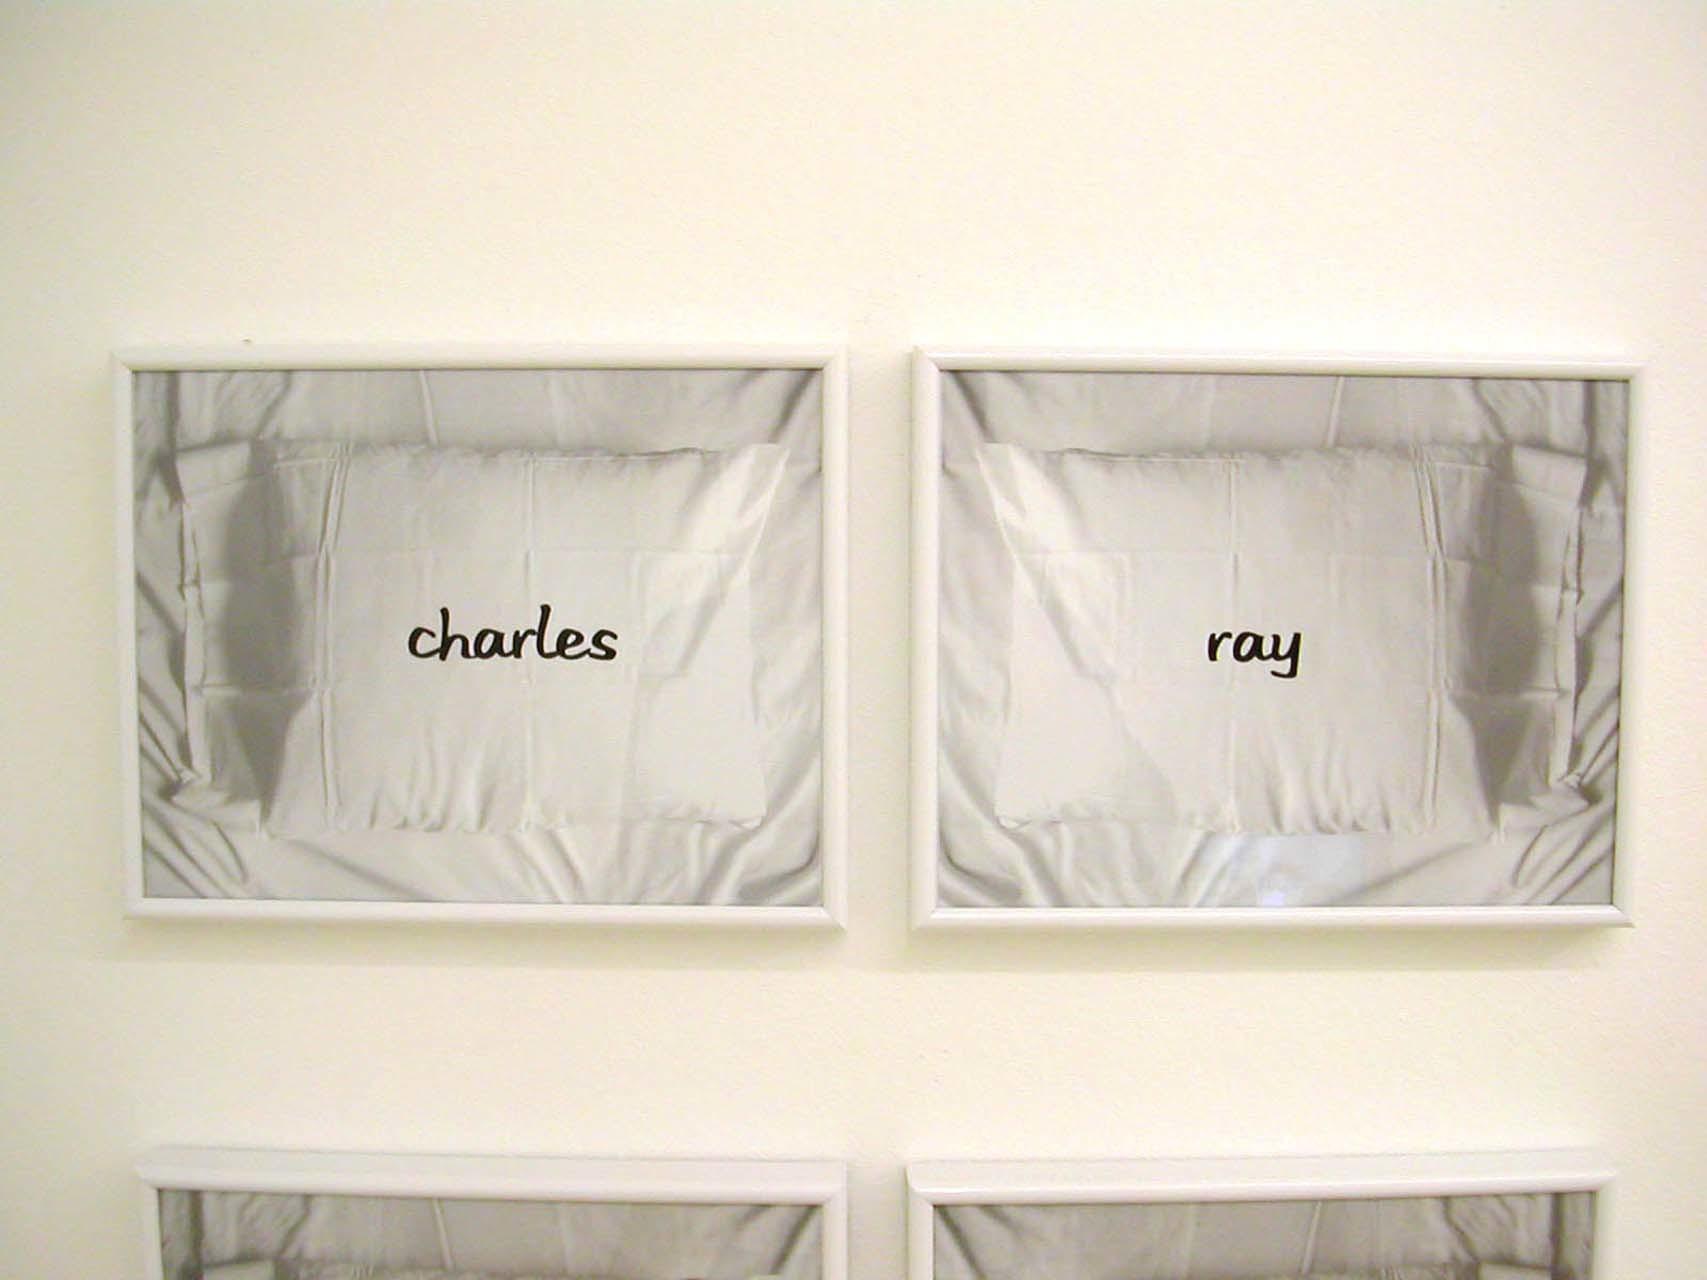 "<div class=""artwork_caption""><p>Charles & Ray, 2002</p></div>"